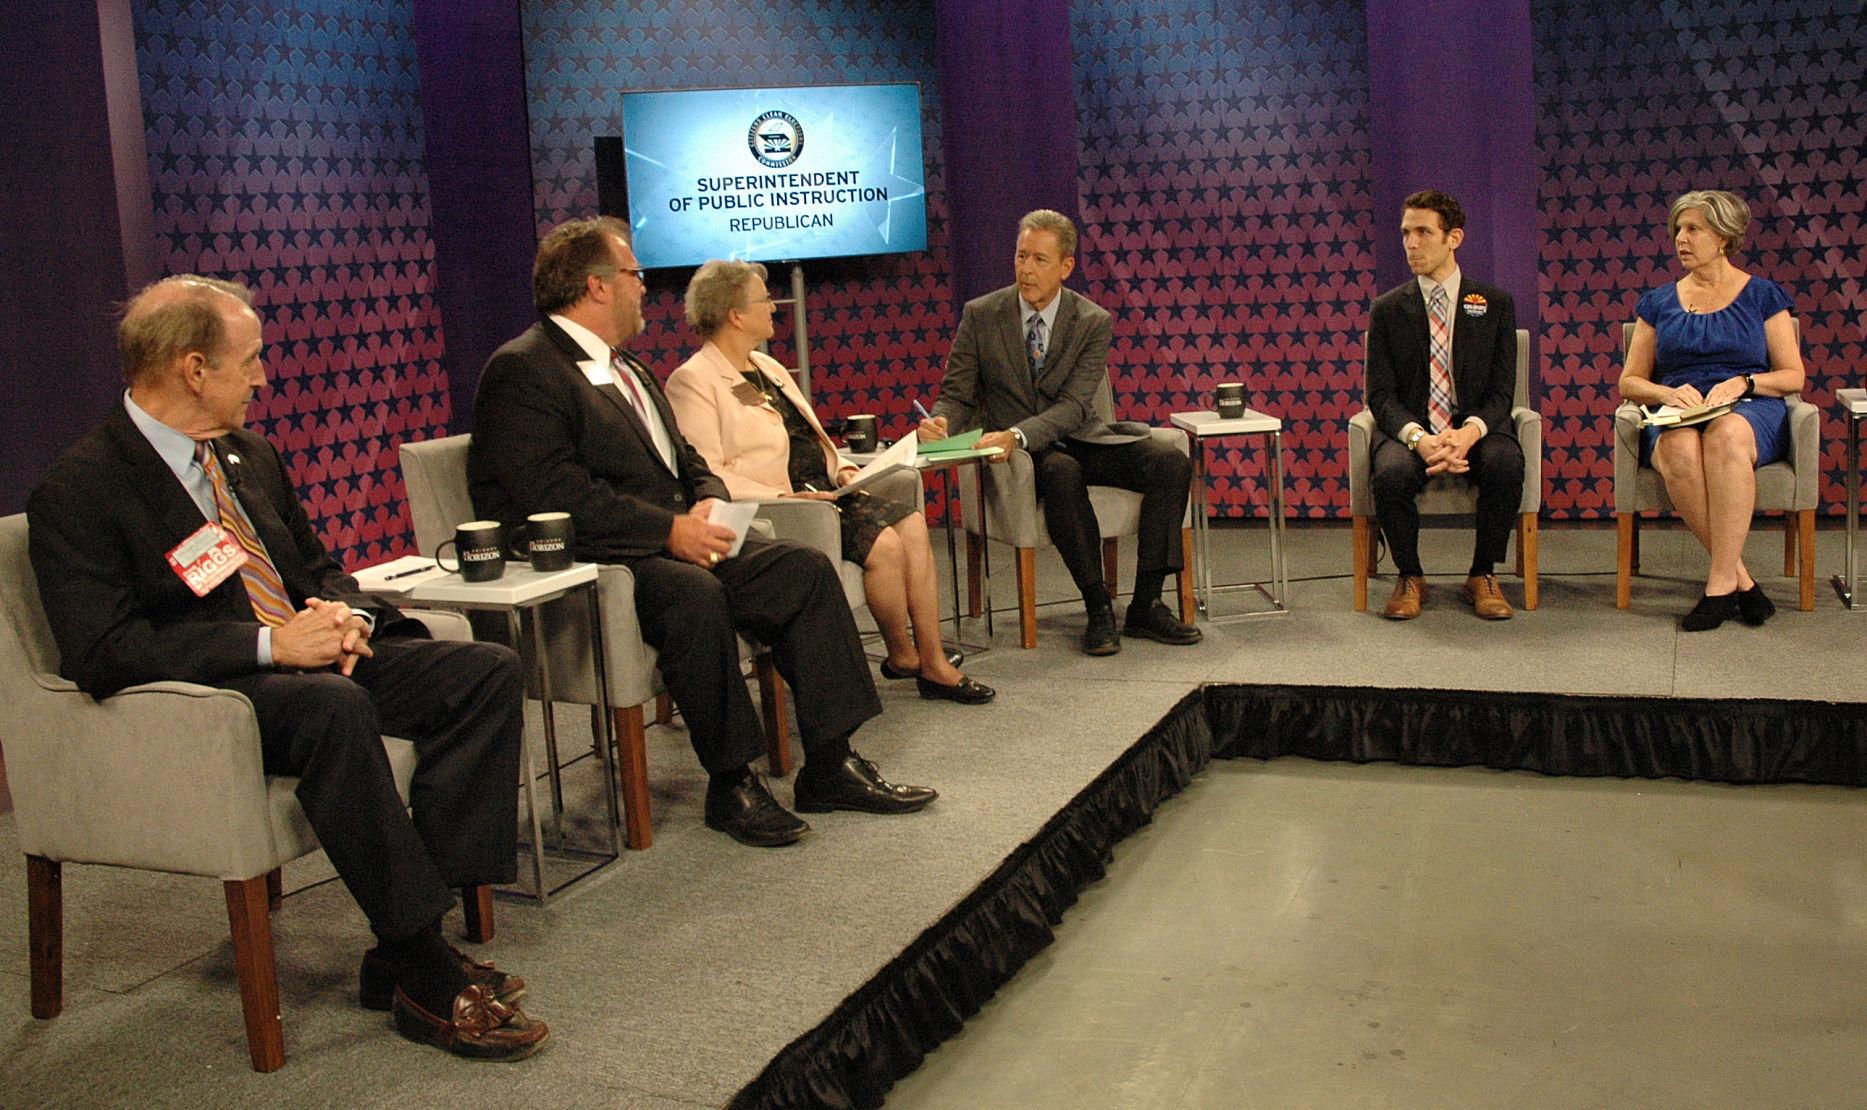 U0027Intelligent Designu0027 Focus Of Debate By GOP Candidates For State School  Chief